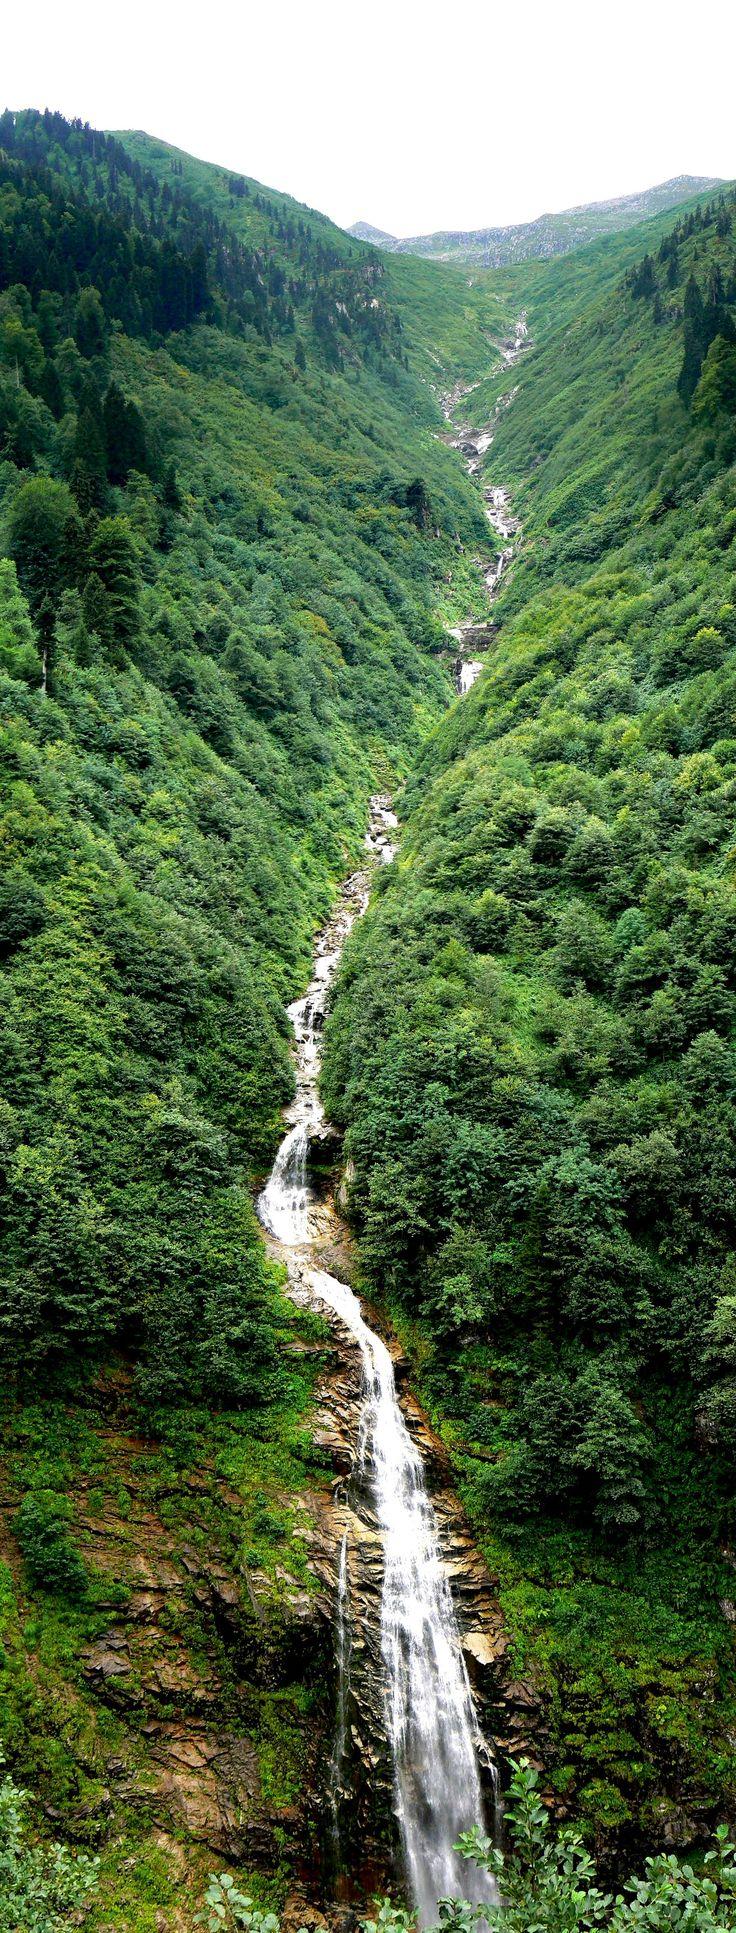 Waterfall at Ayder Yaylası - Rize,Turkey